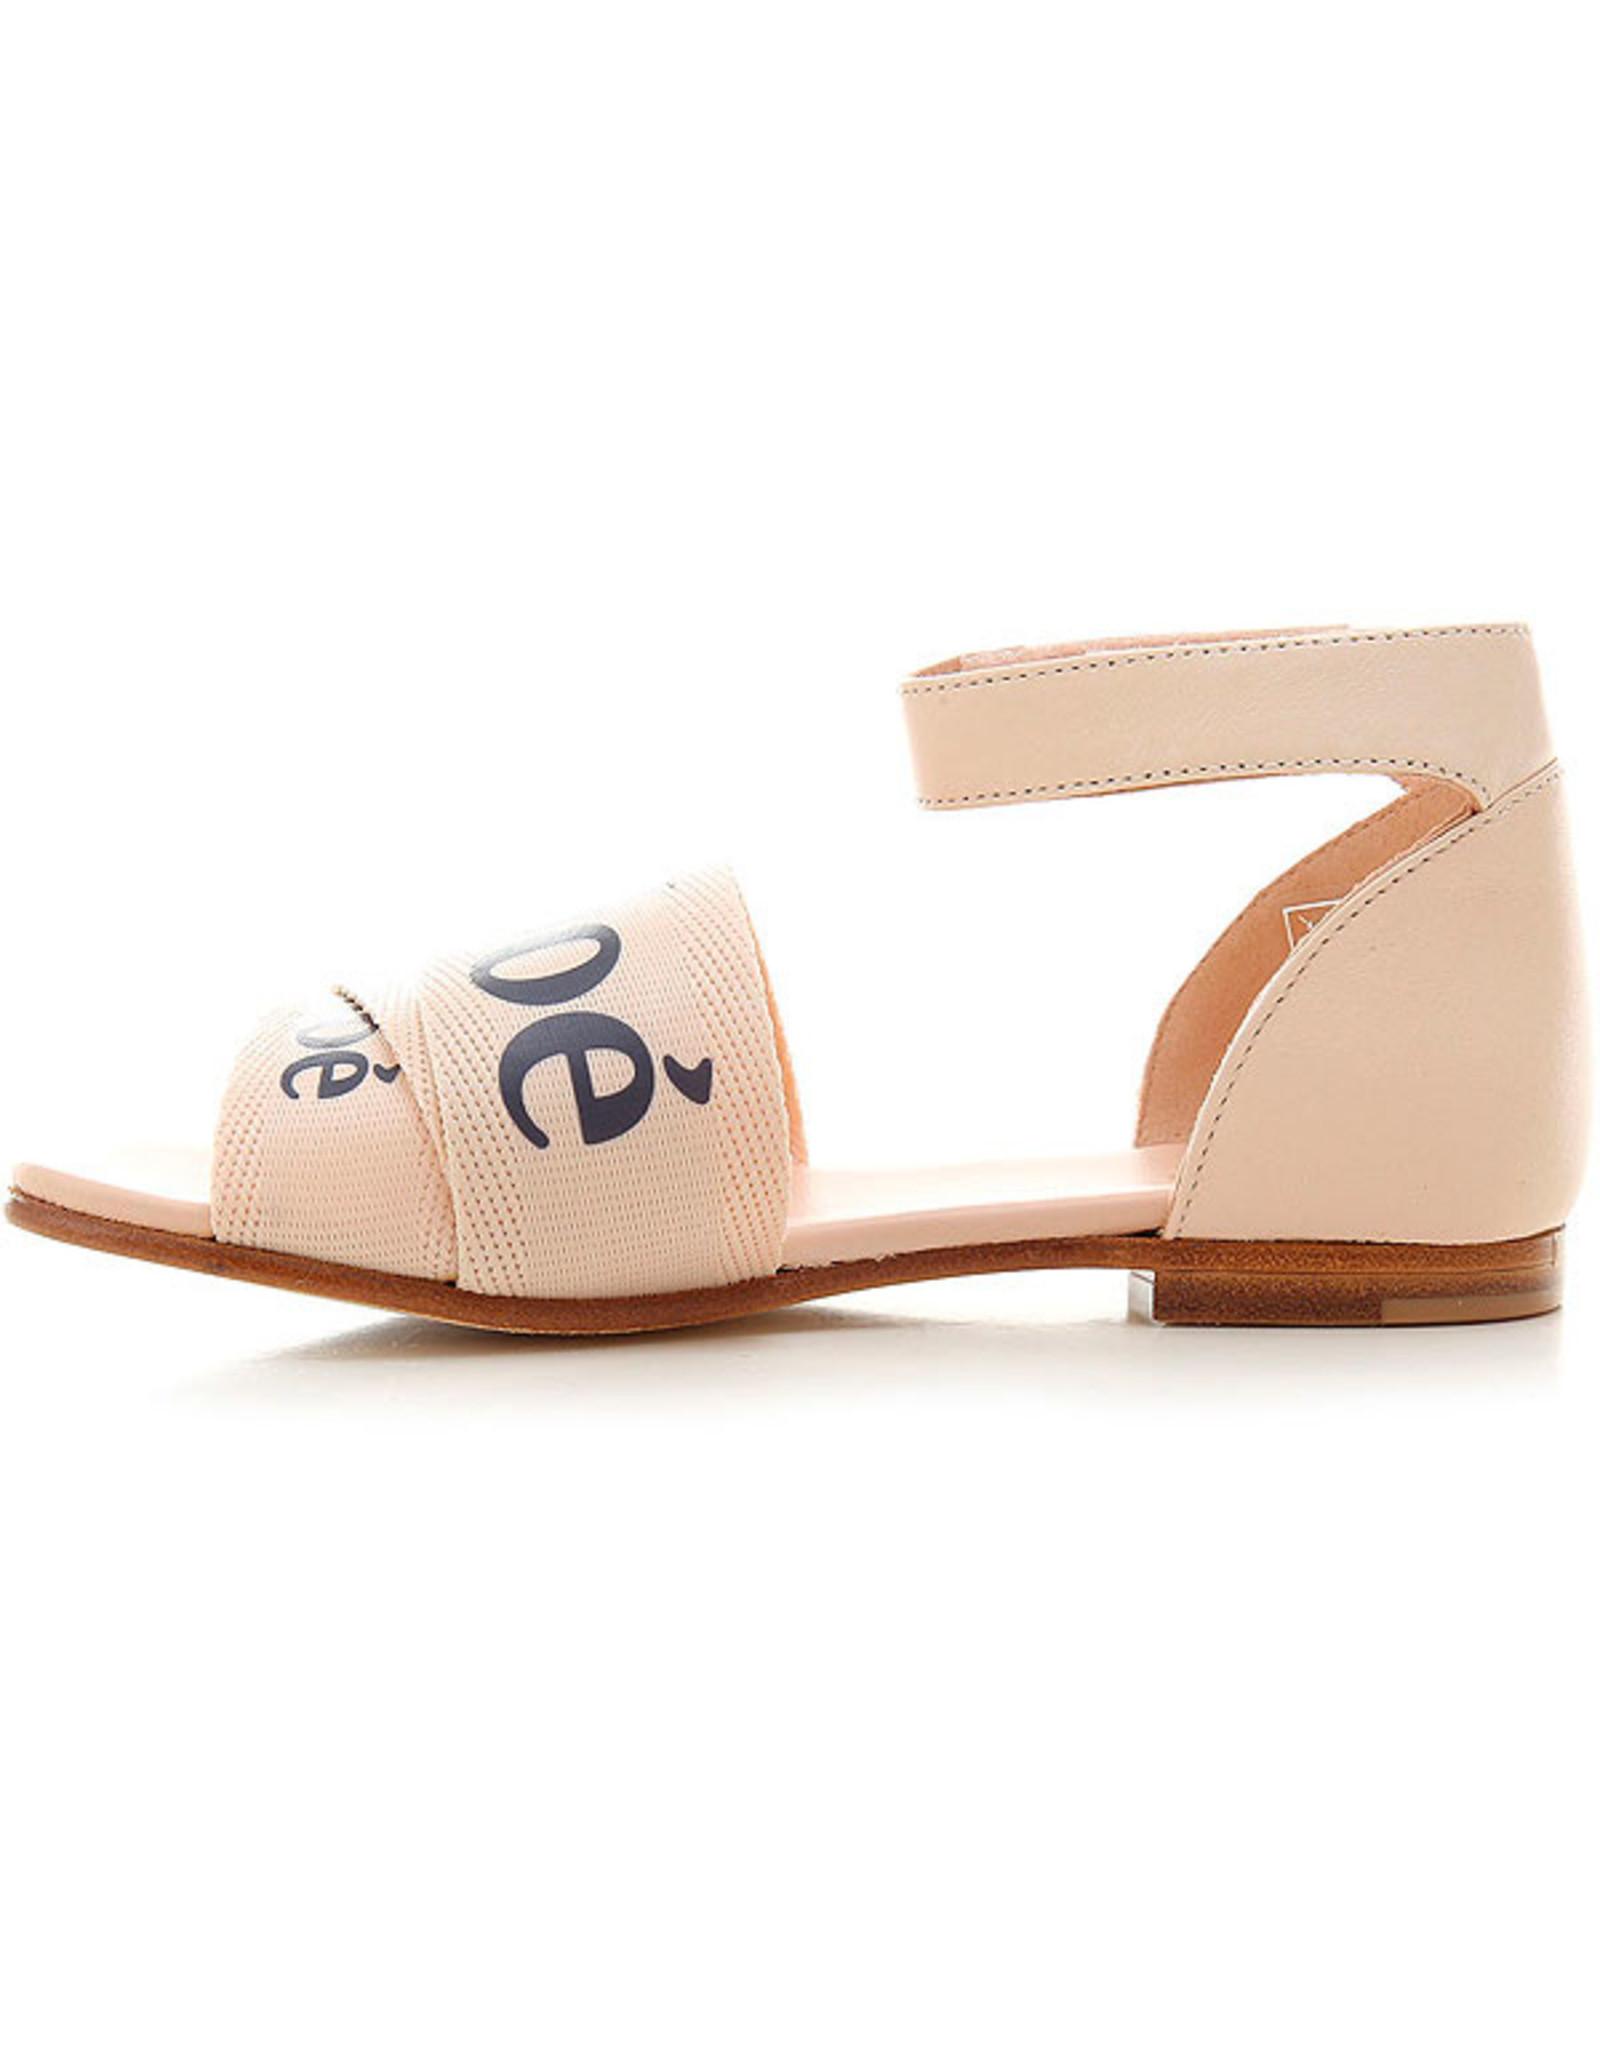 Chloe Chloe SS21 C19128 sandalen